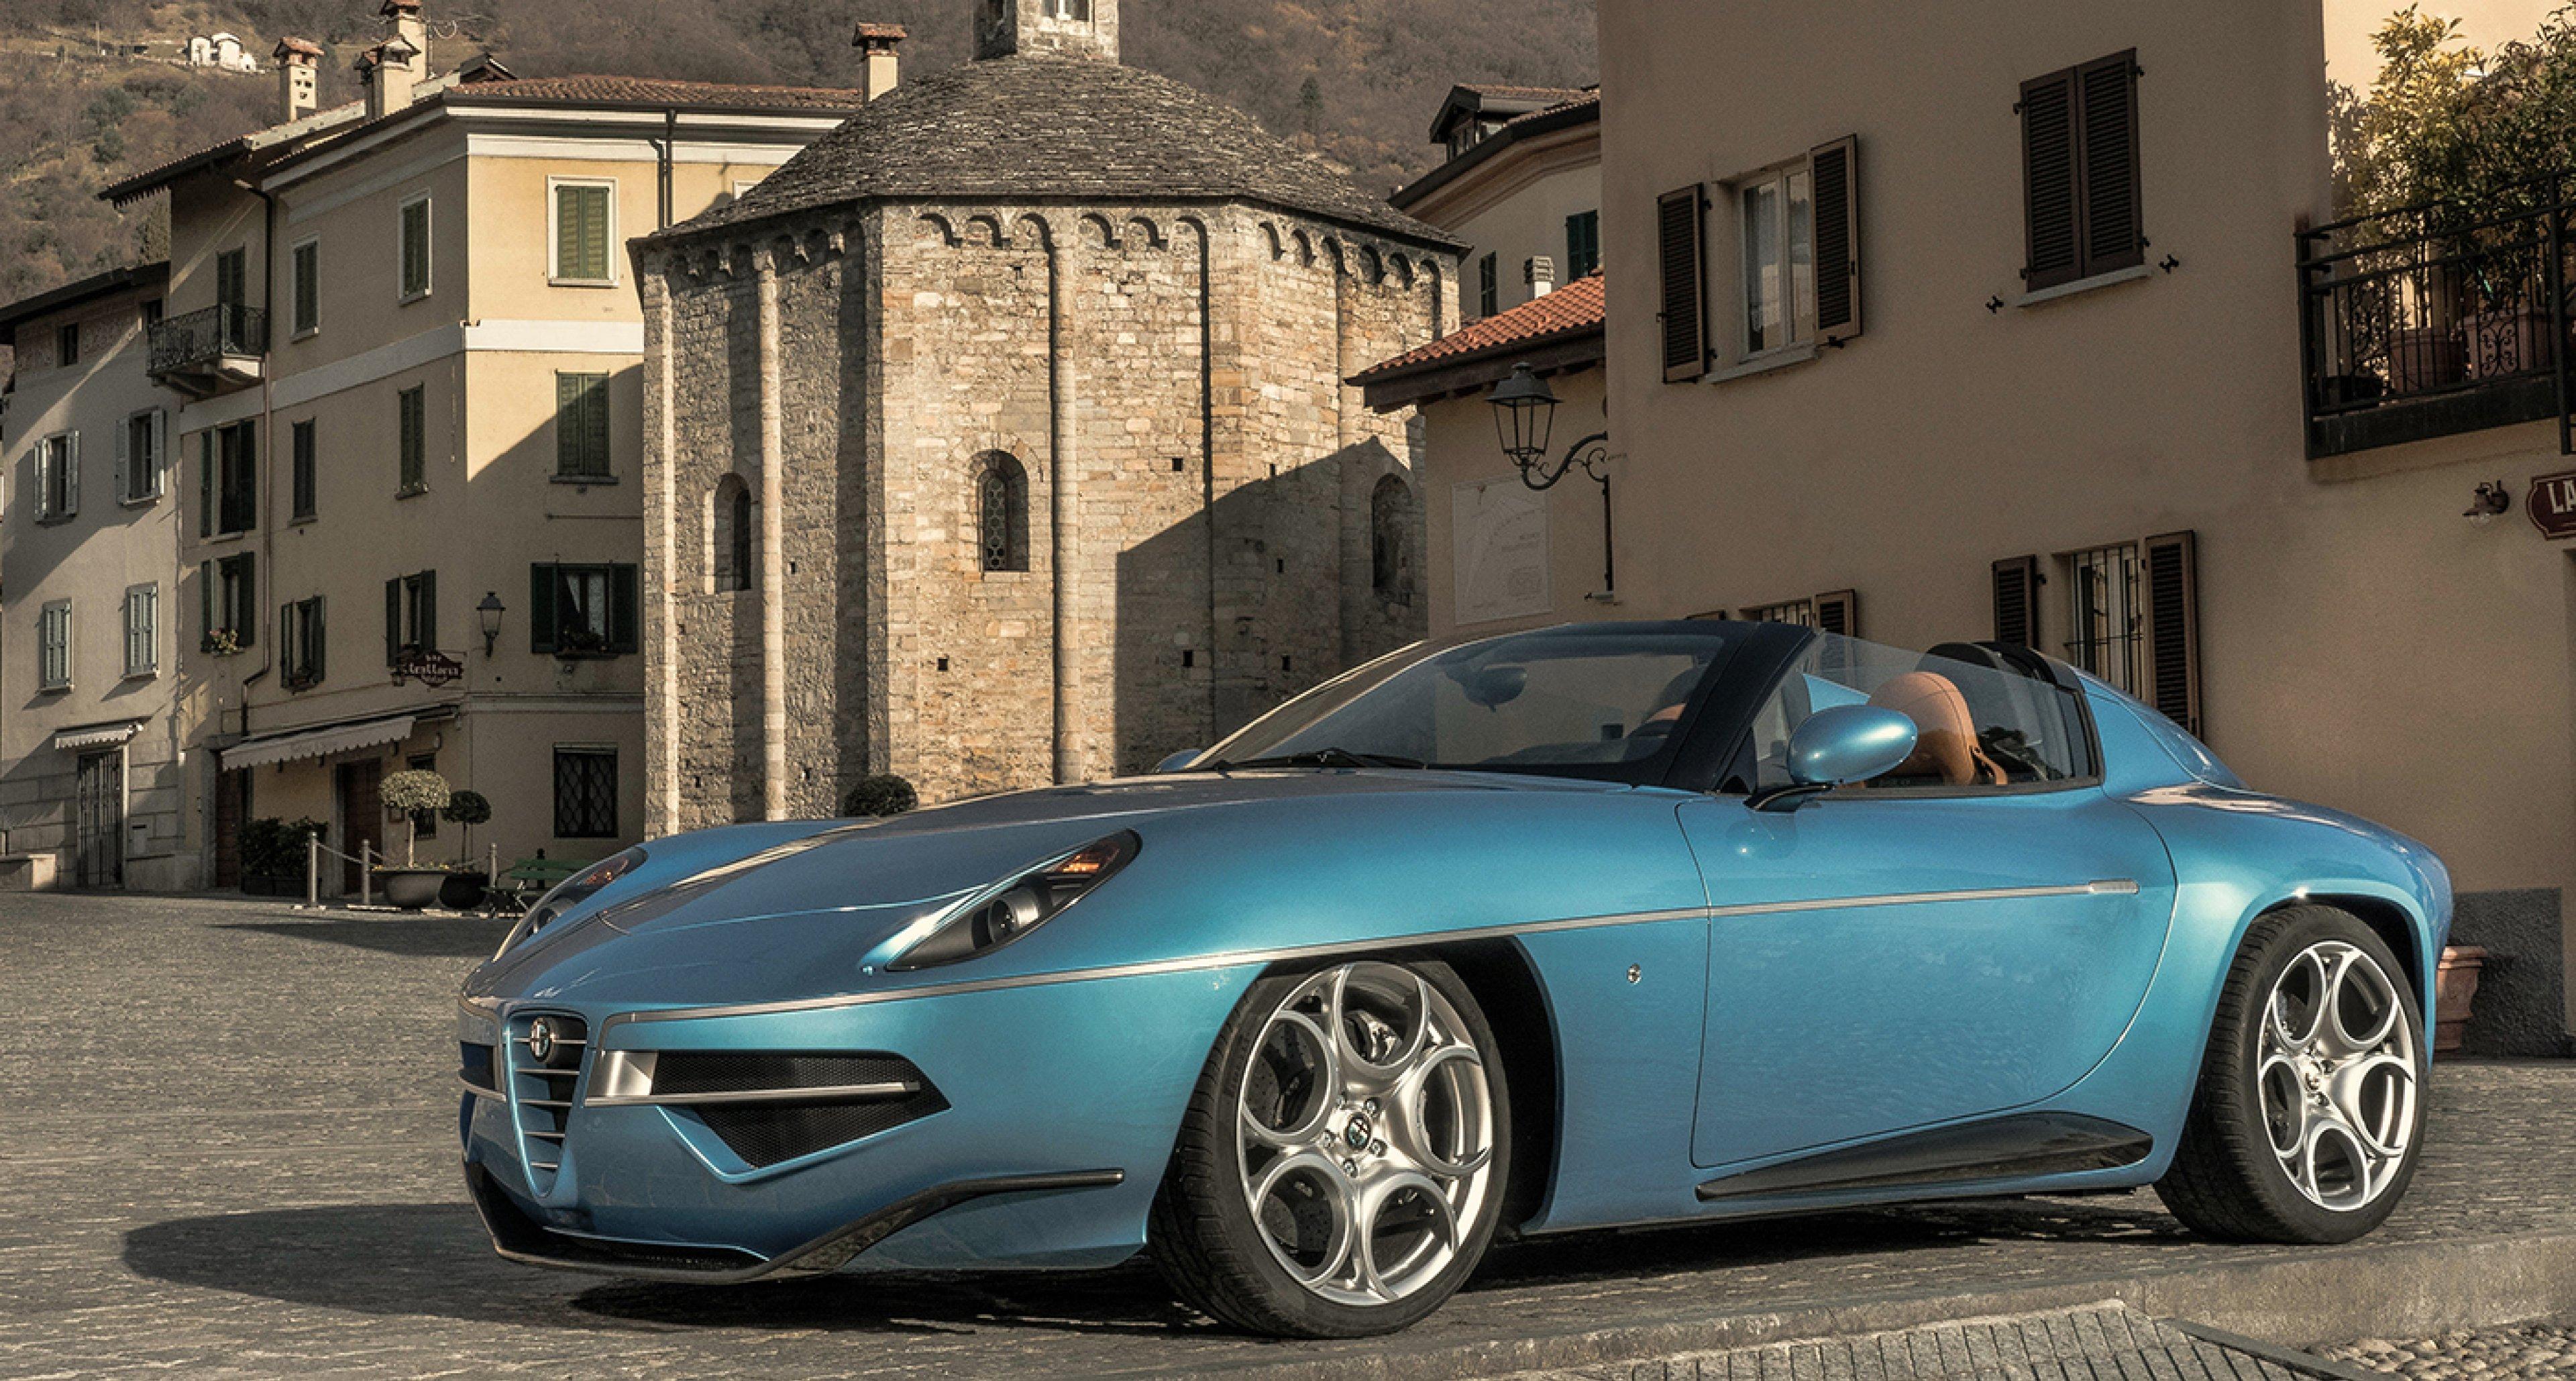 Alfa Romeo Disco Volante For Sale >> Exclusive The Inside Story Of Touring S New Disco Volante